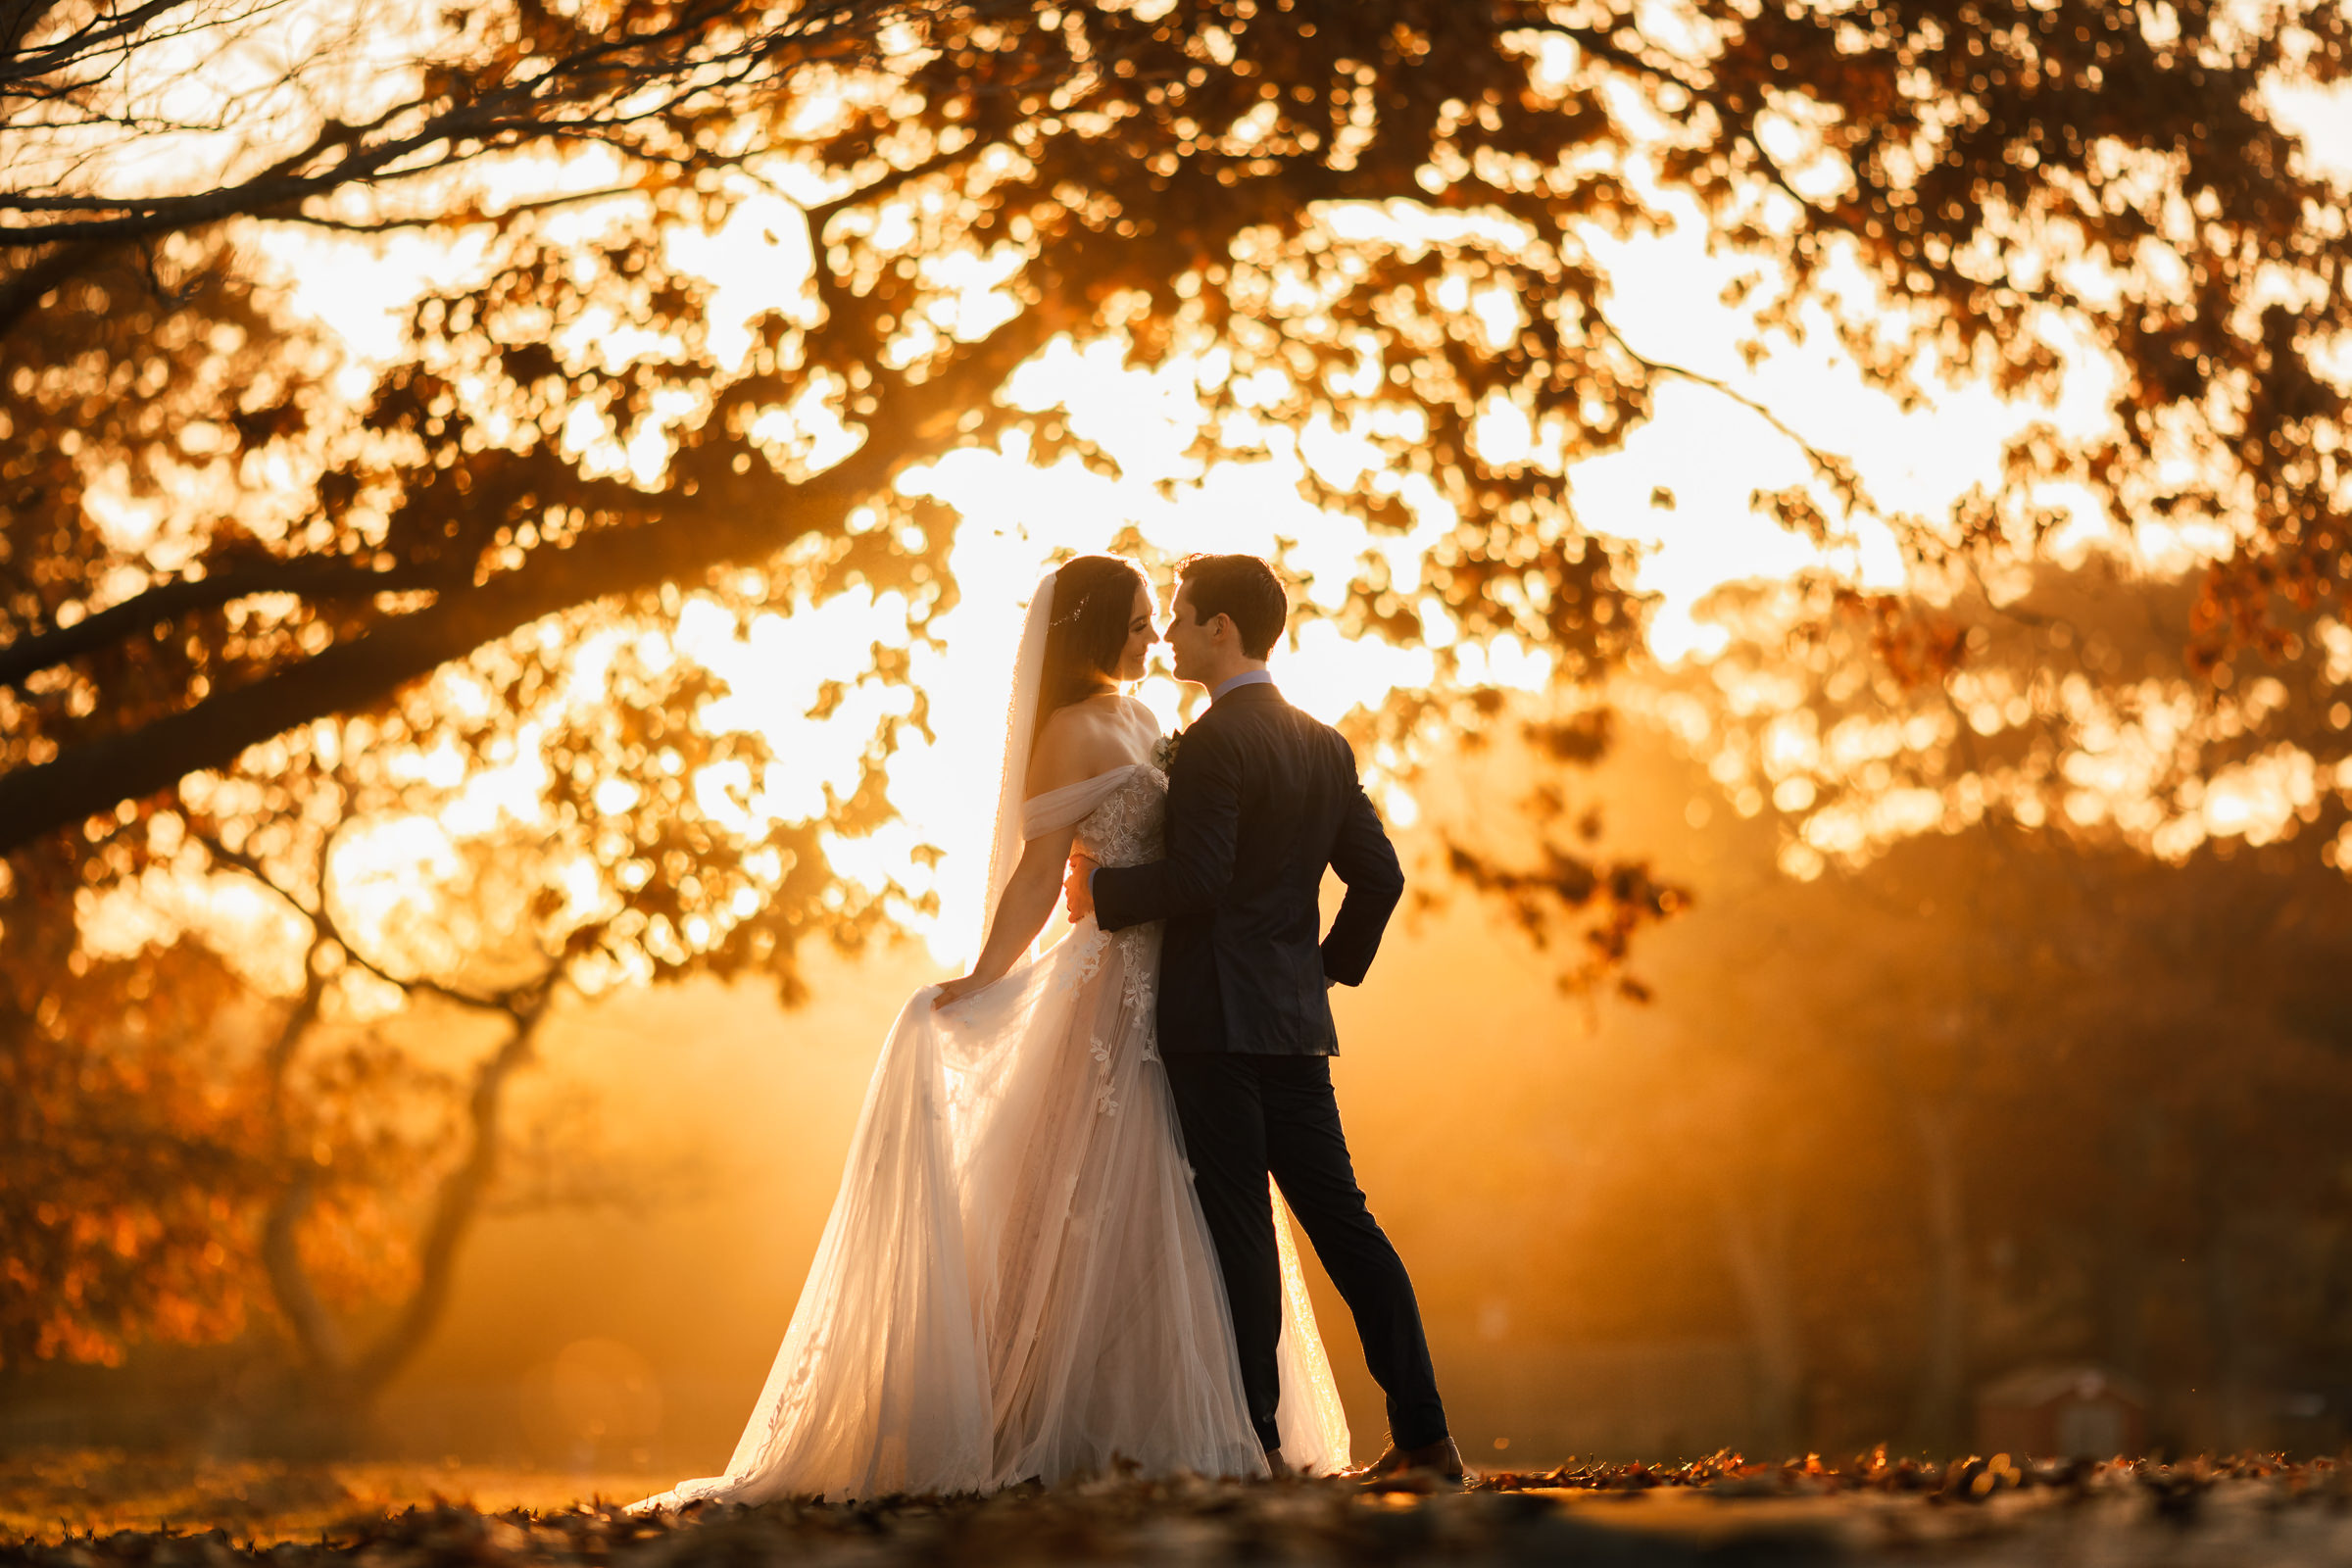 backlit-couple-against-trees-m-hart-los-angeles-photographer